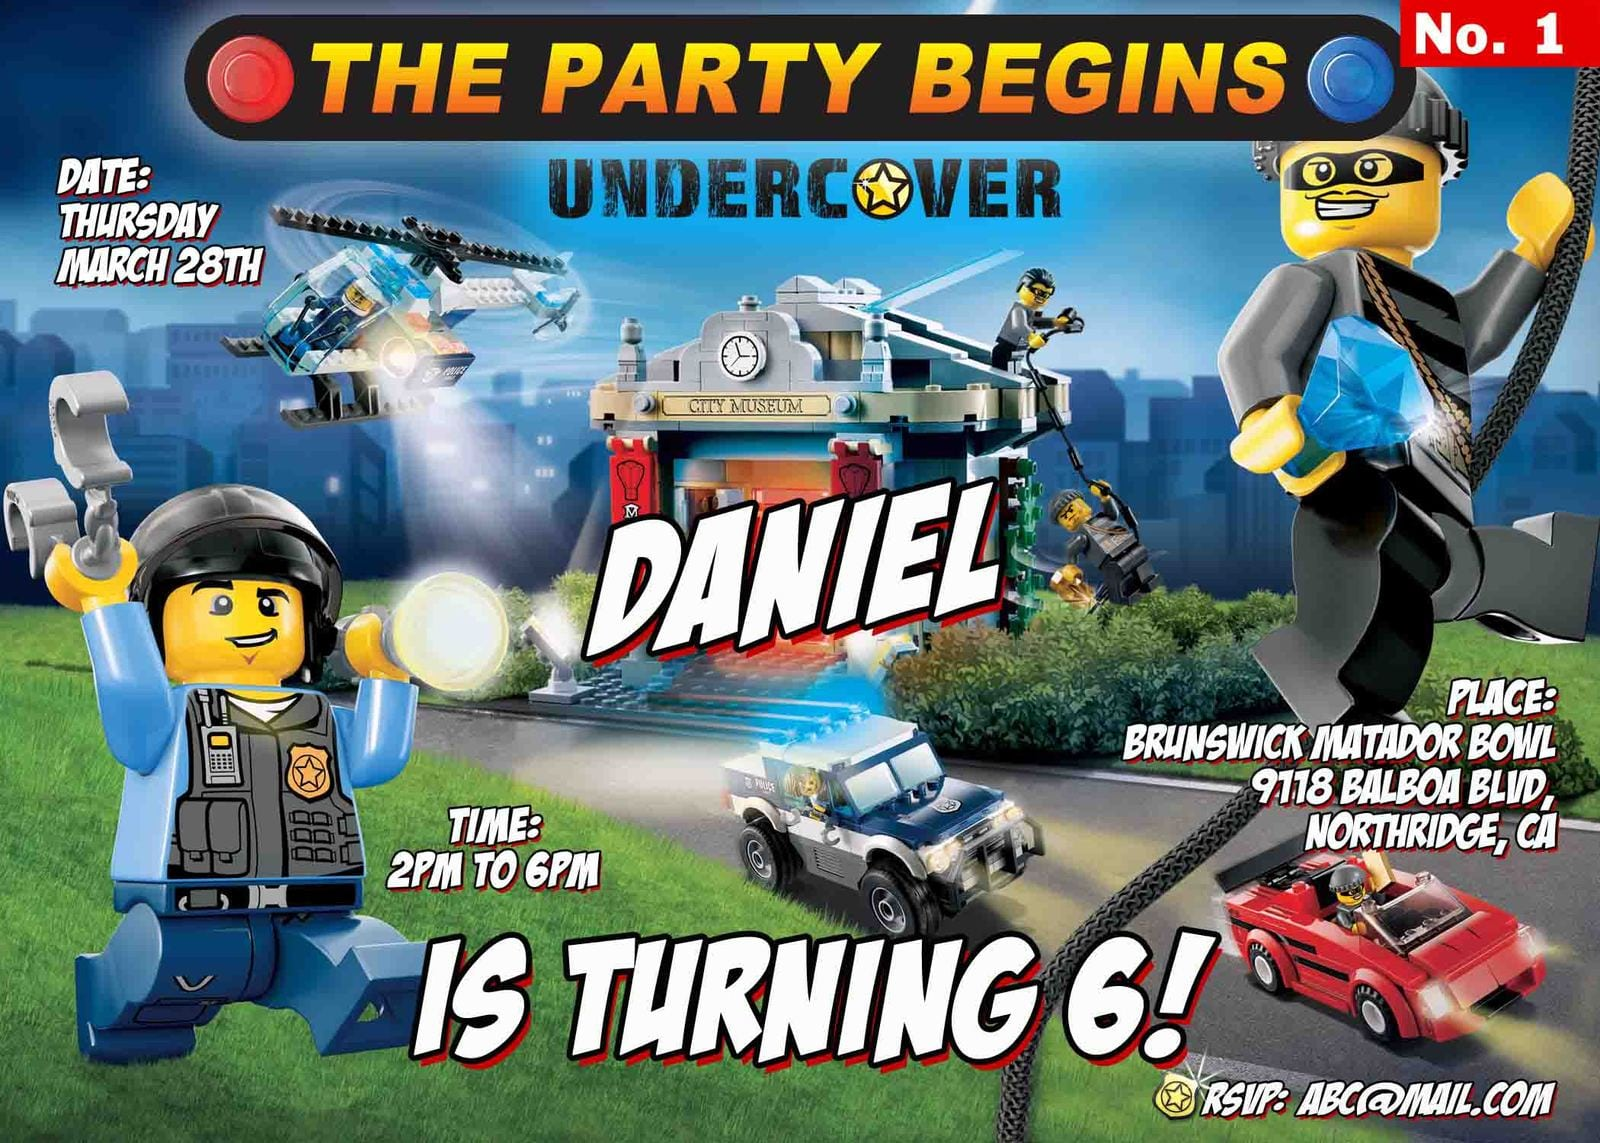 Lego City Party Invitations - Mickey Mouse Invitations Templates